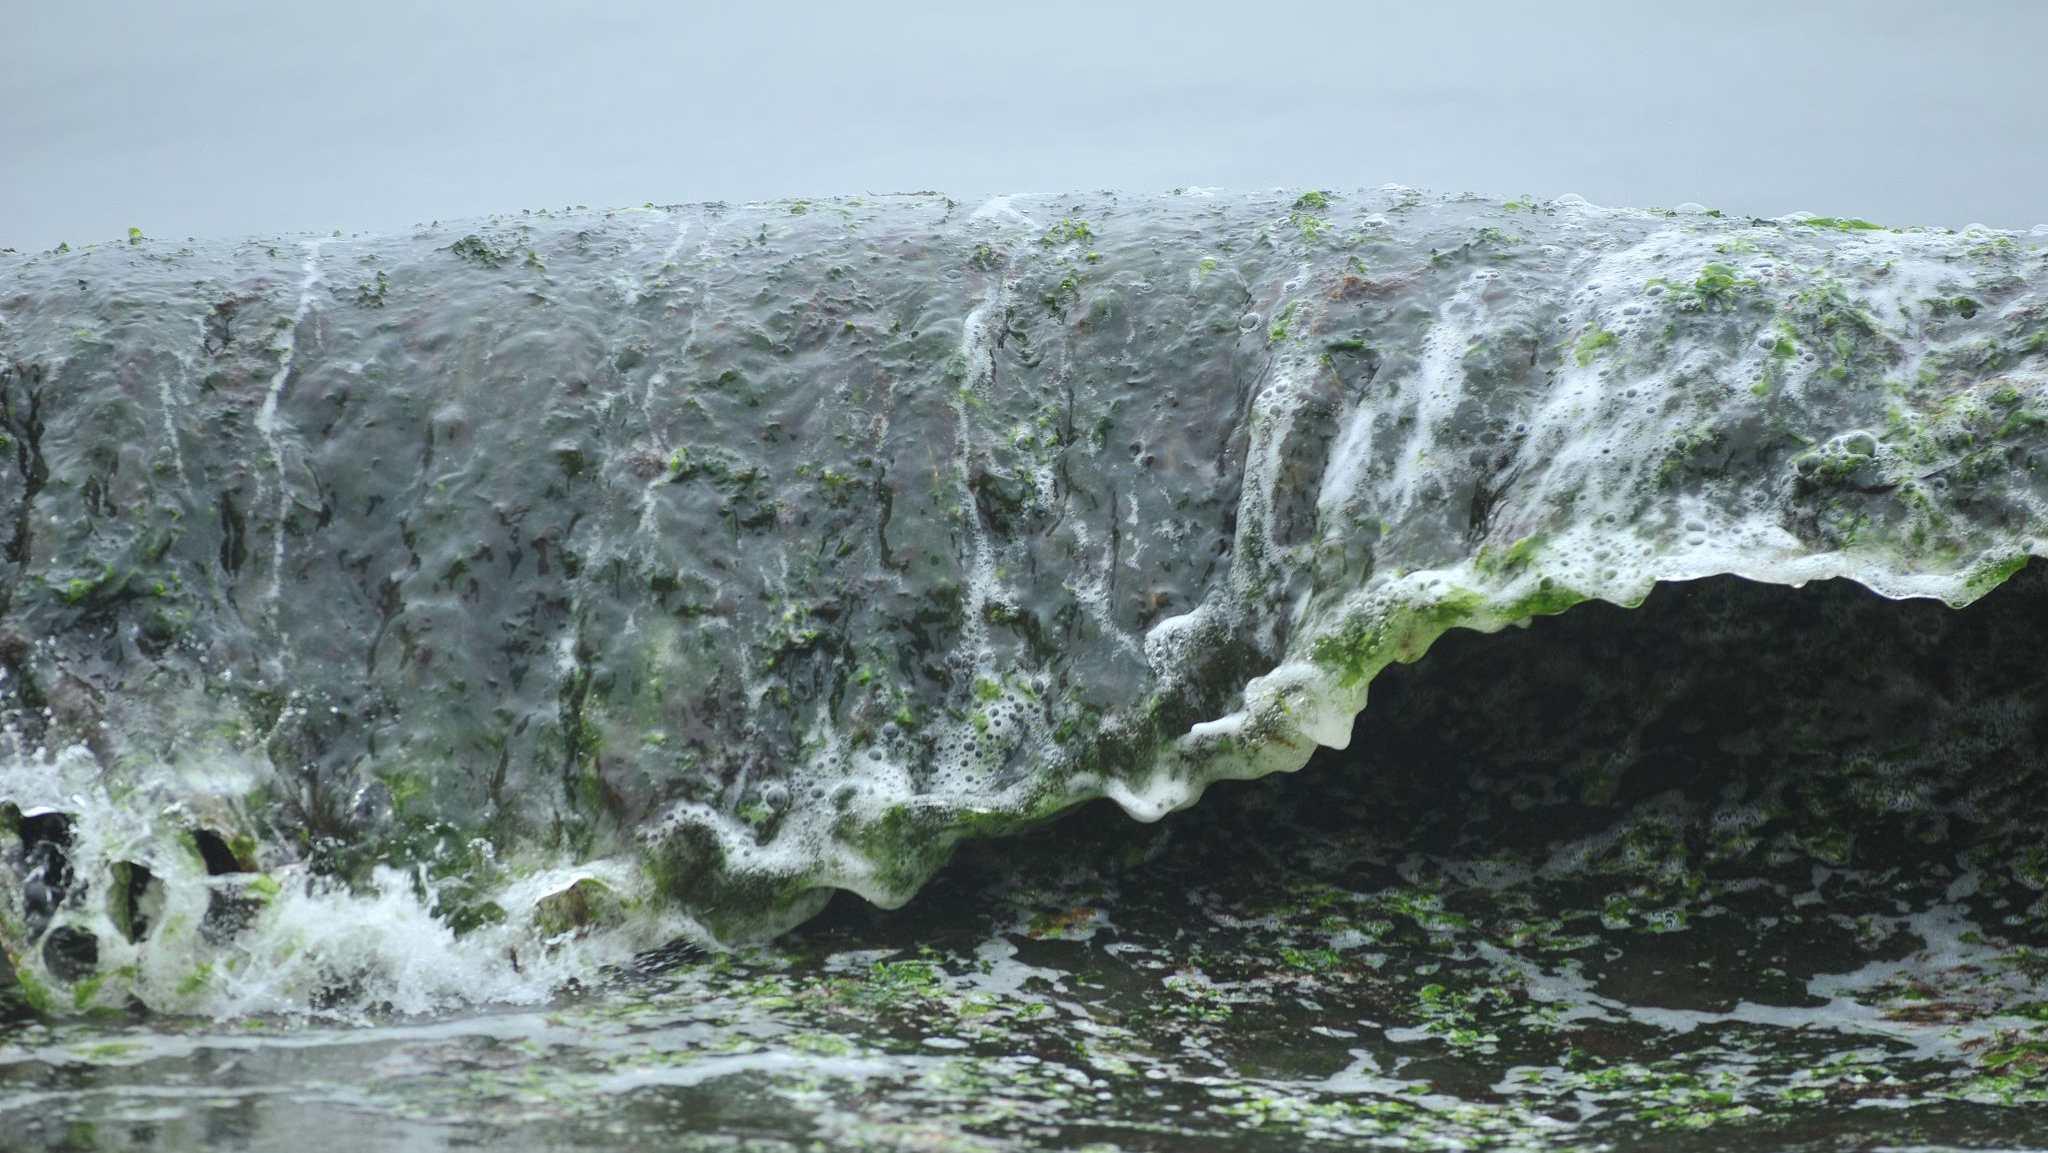 China develops harmless treatment method of blue algae